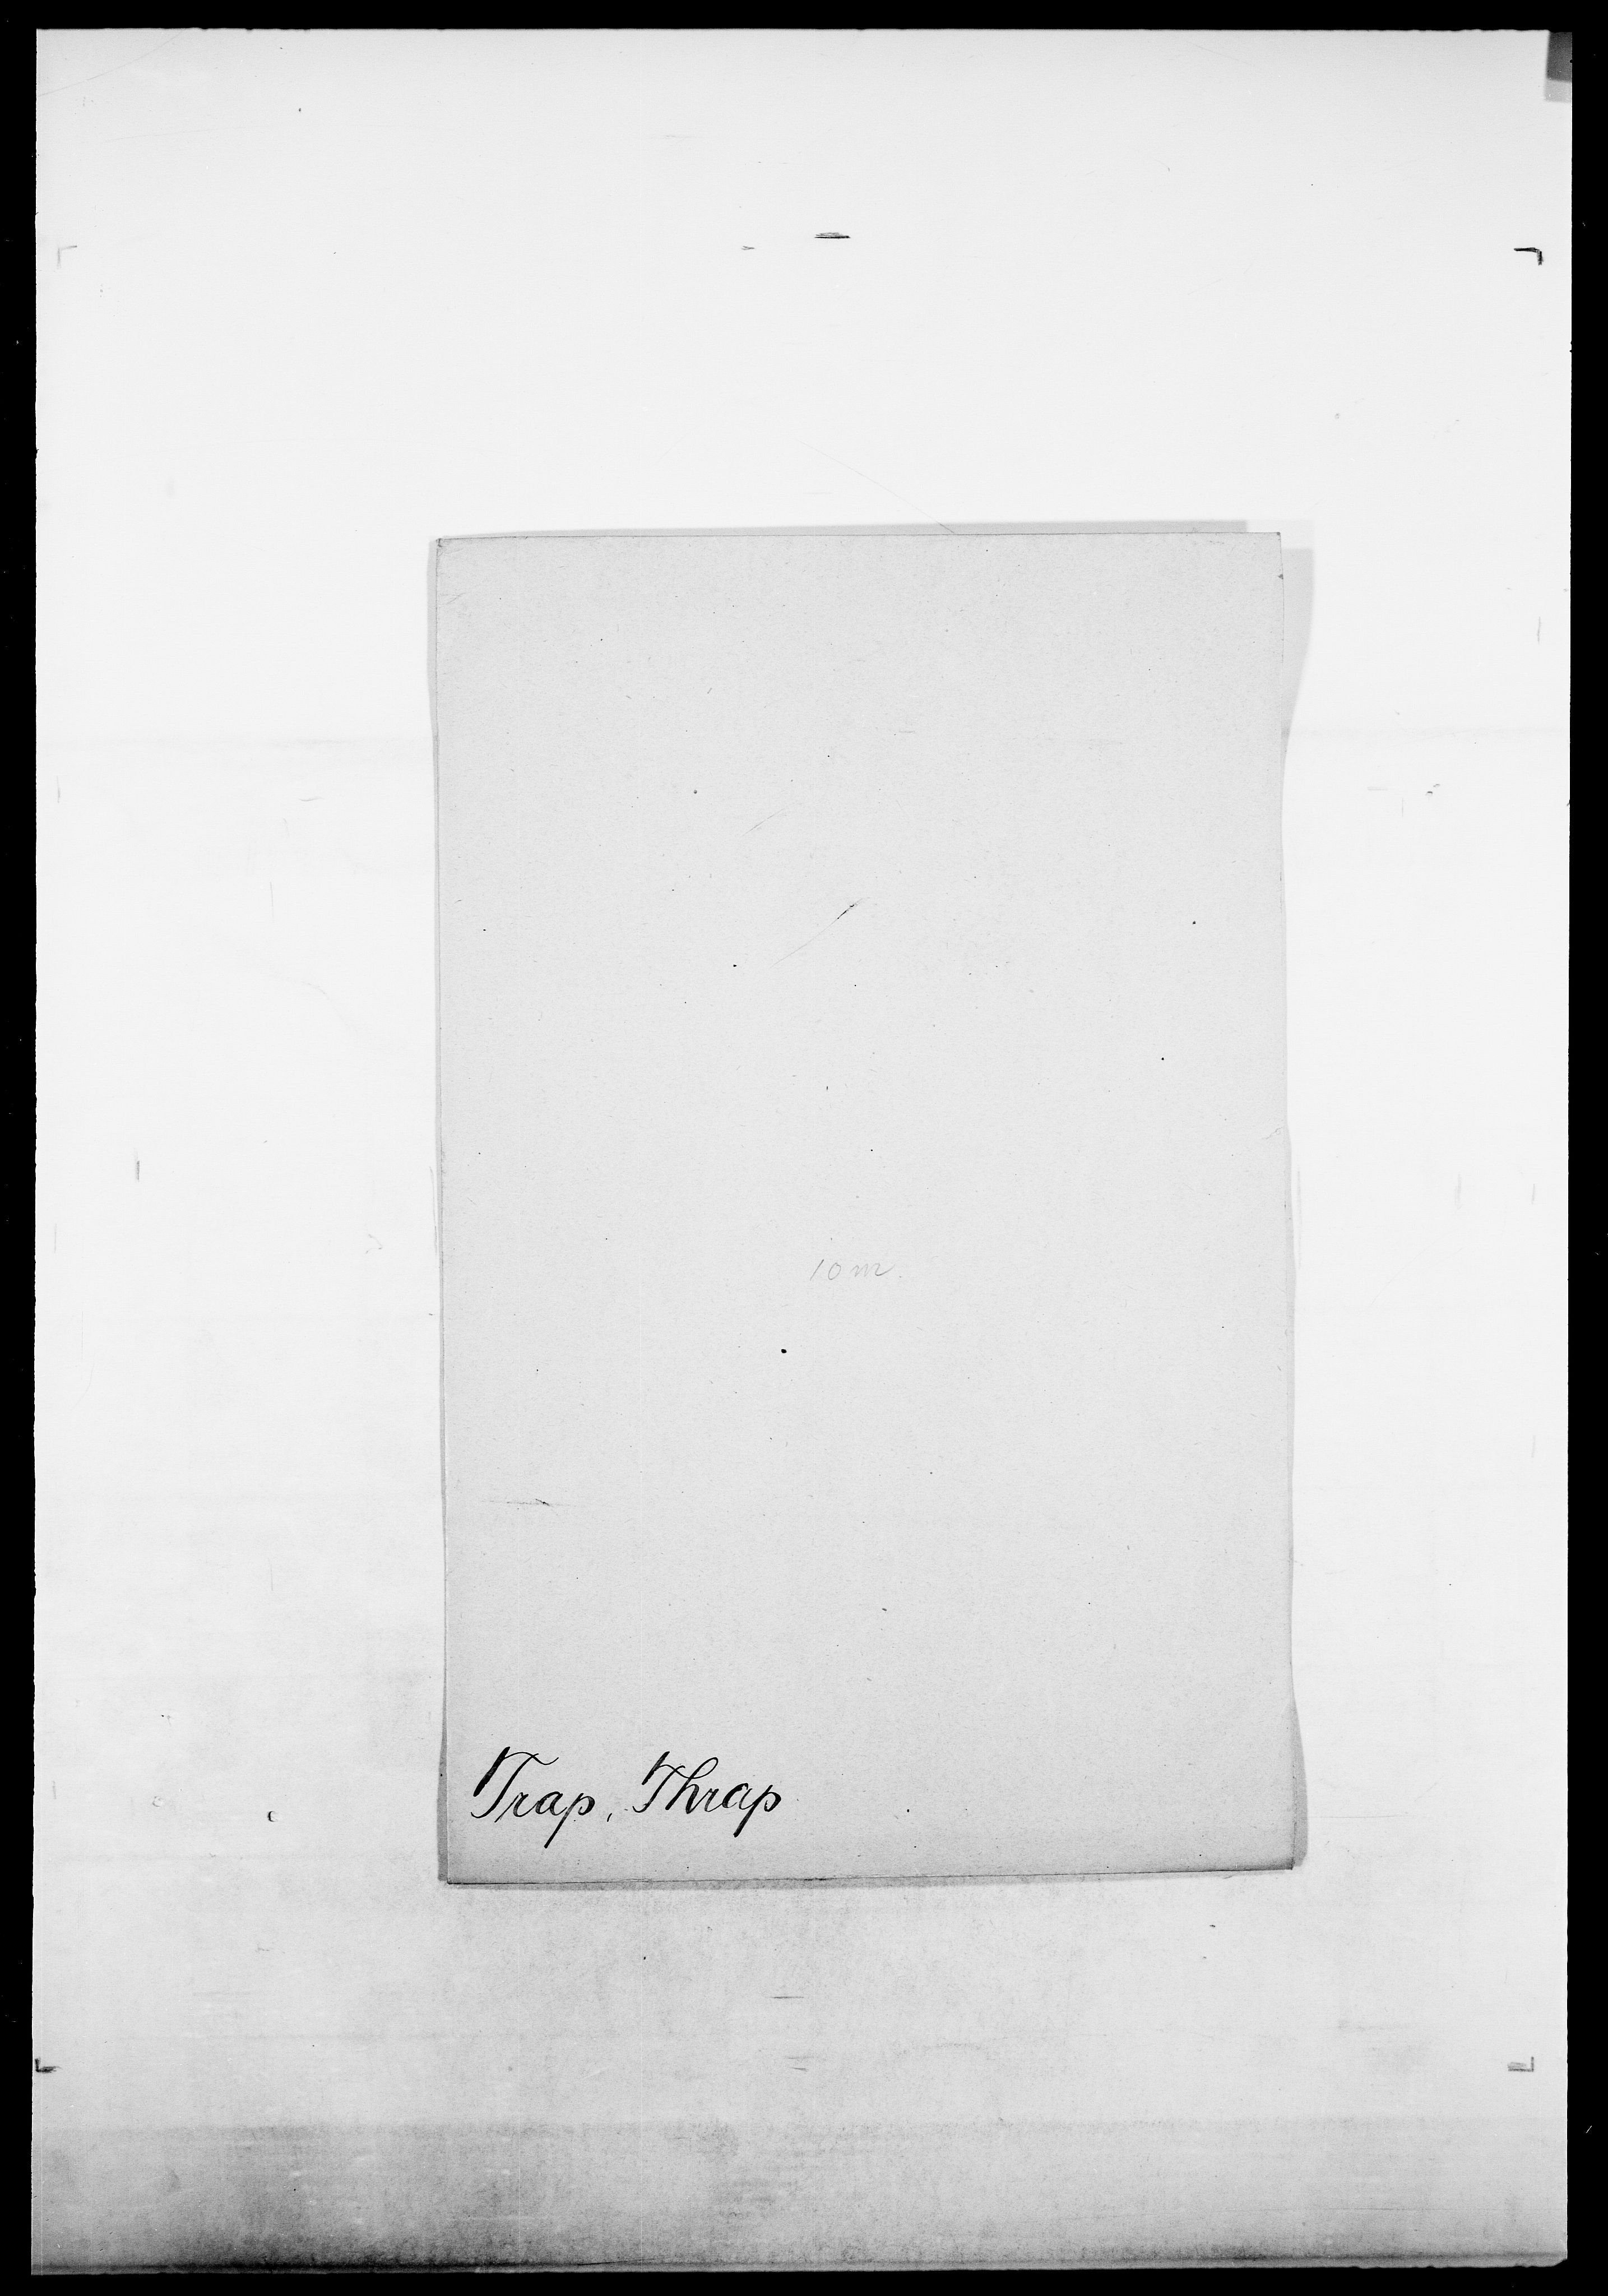 SAO, Delgobe, Charles Antoine - samling, D/Da/L0039: Thorsen - Urup, s. 301